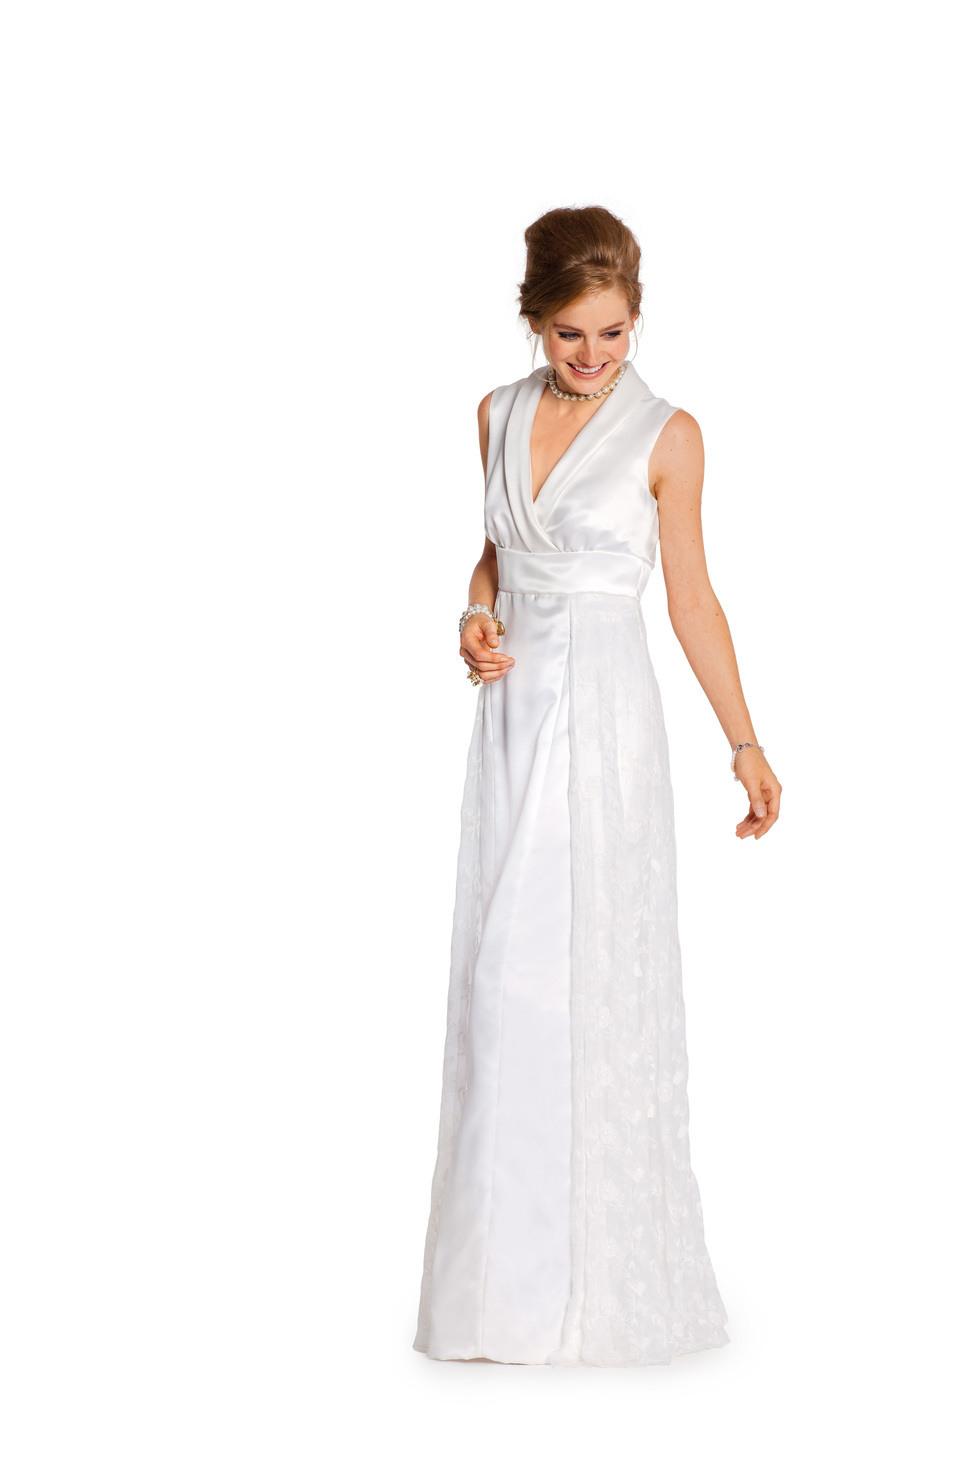 10 Perfekt Burda Abendkleid Design10 Spektakulär Burda Abendkleid Bester Preis